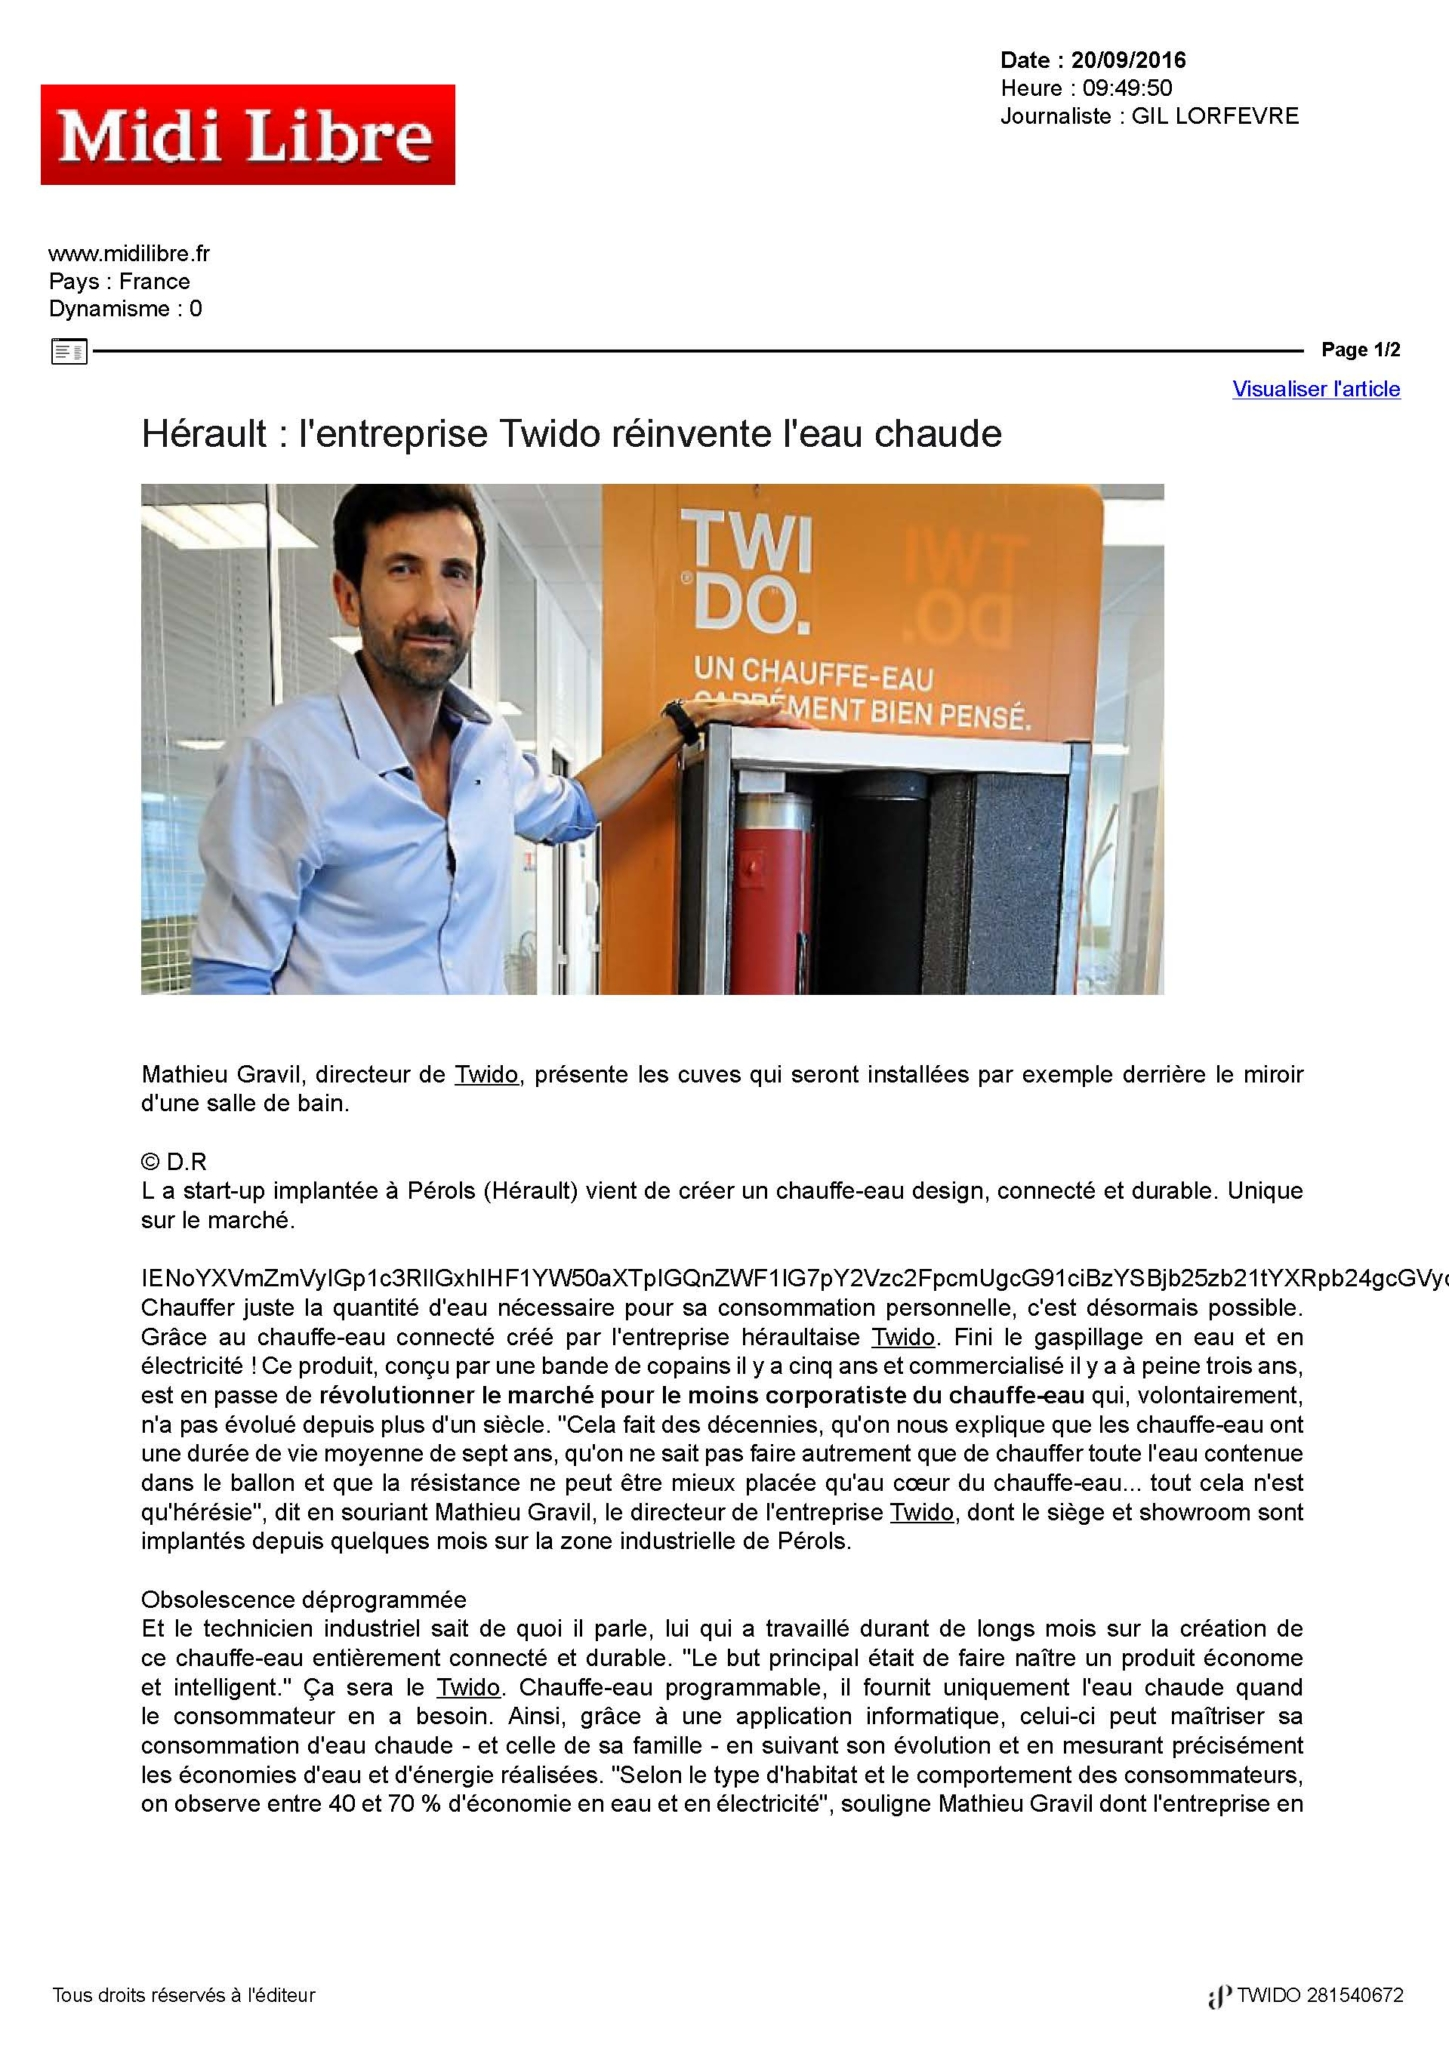 Midi Libre parle de Twido